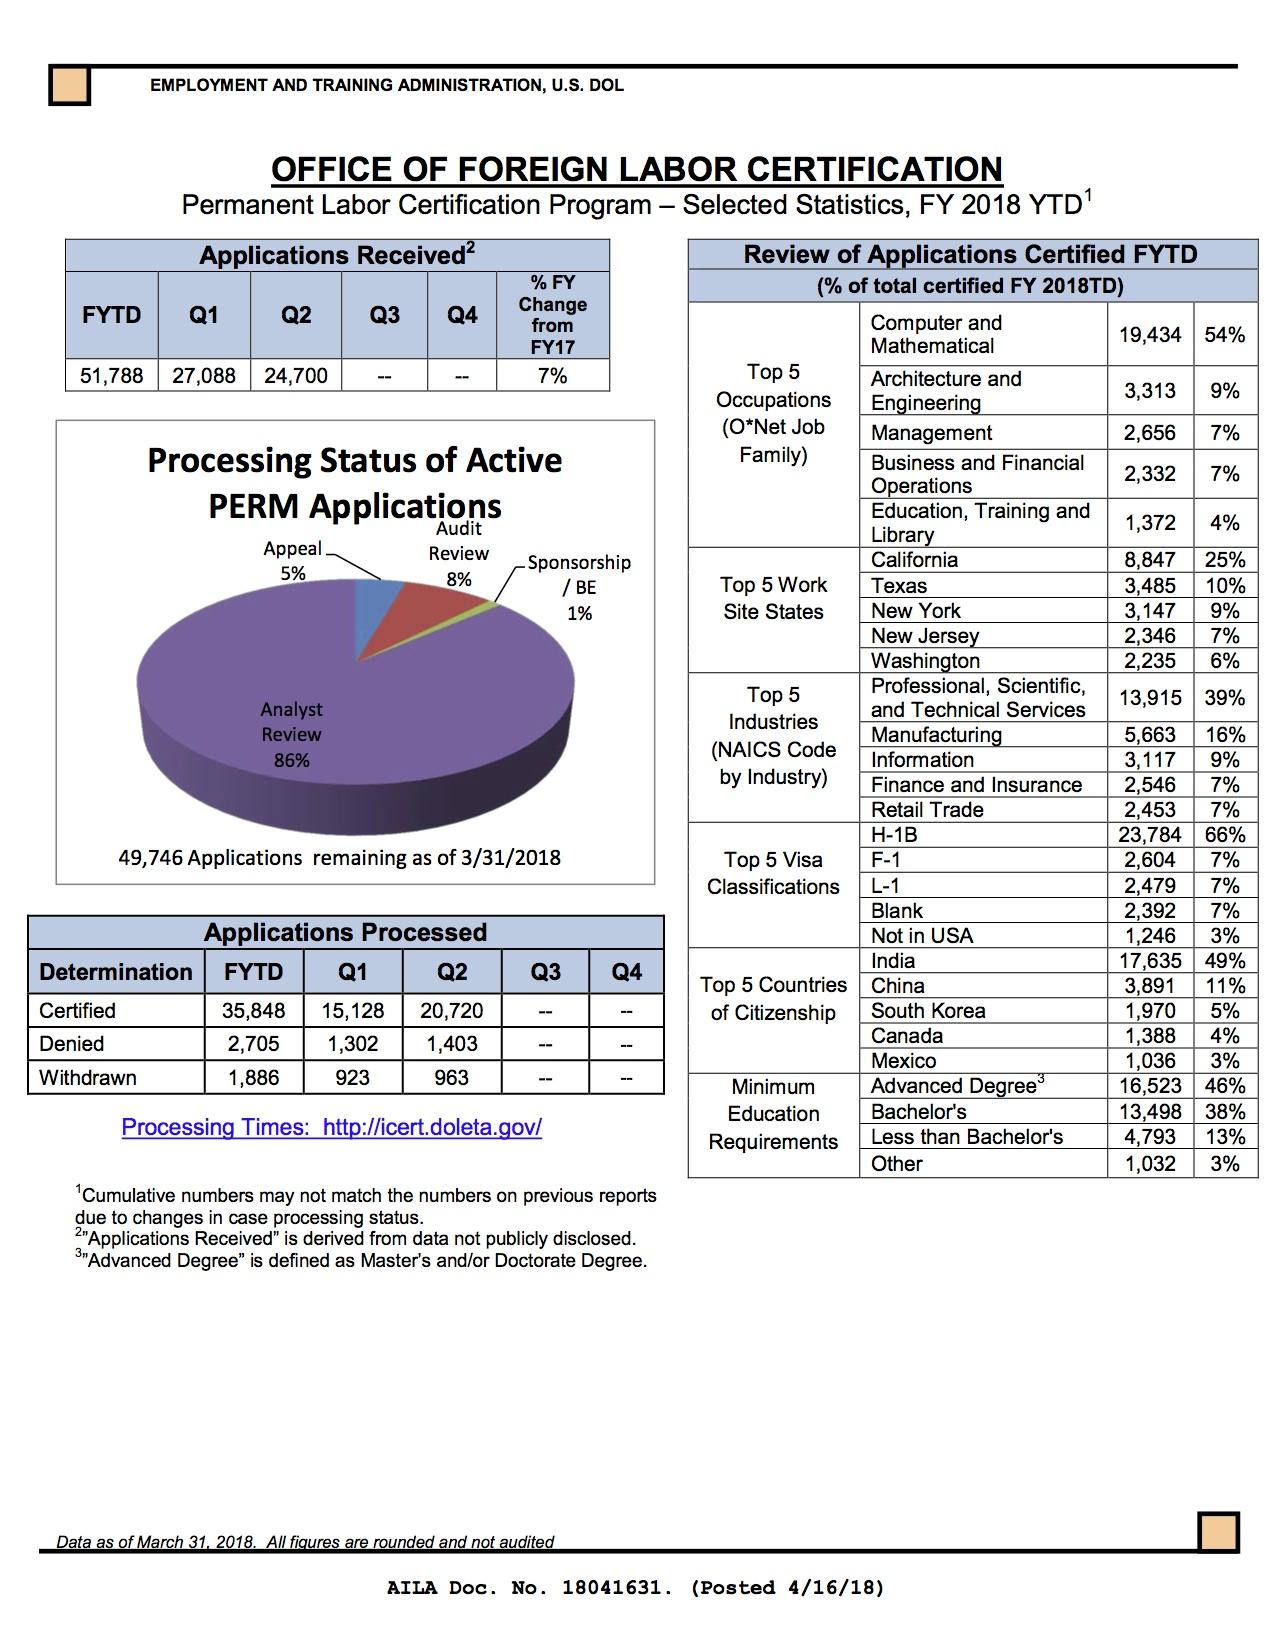 PERM Stats OFLC 2018 Q1-Q2.jpg